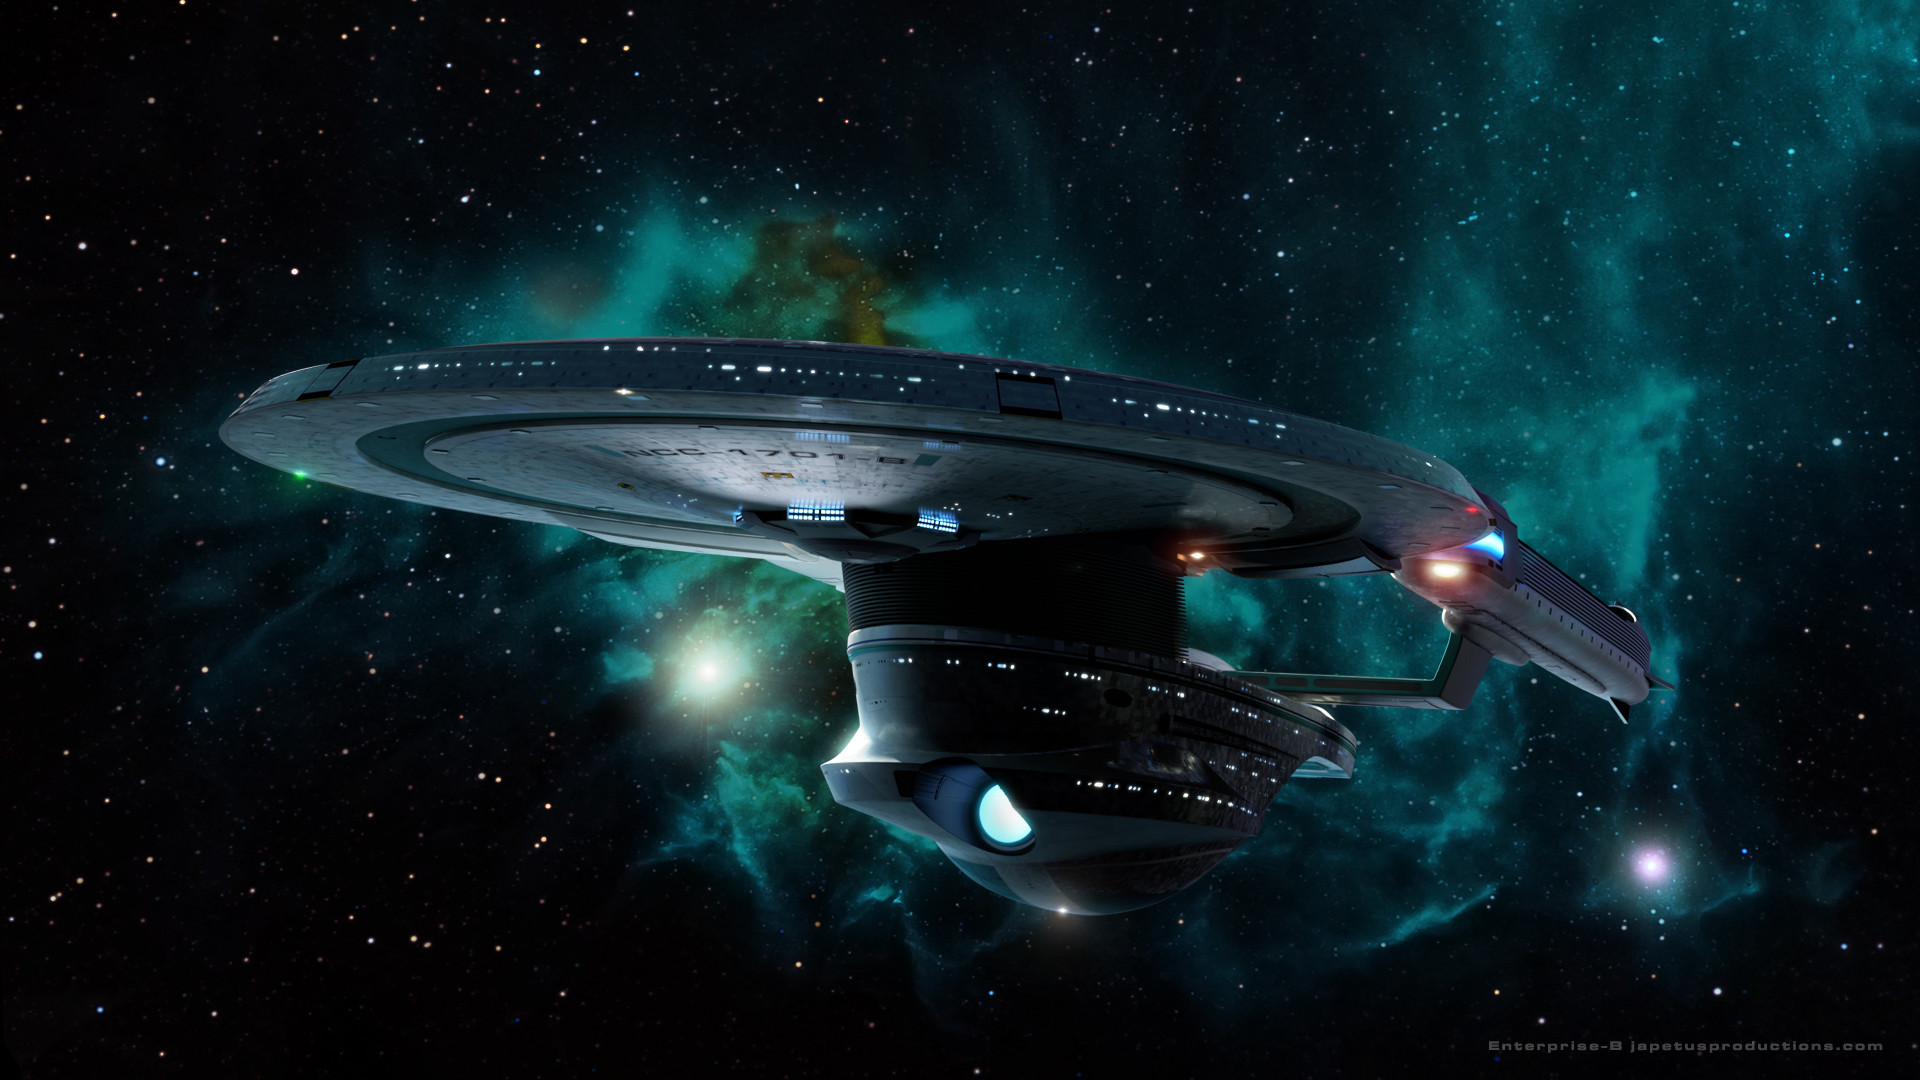 Star Trek Starship Enterprise Spaceship Stars Nebula wallpaper .